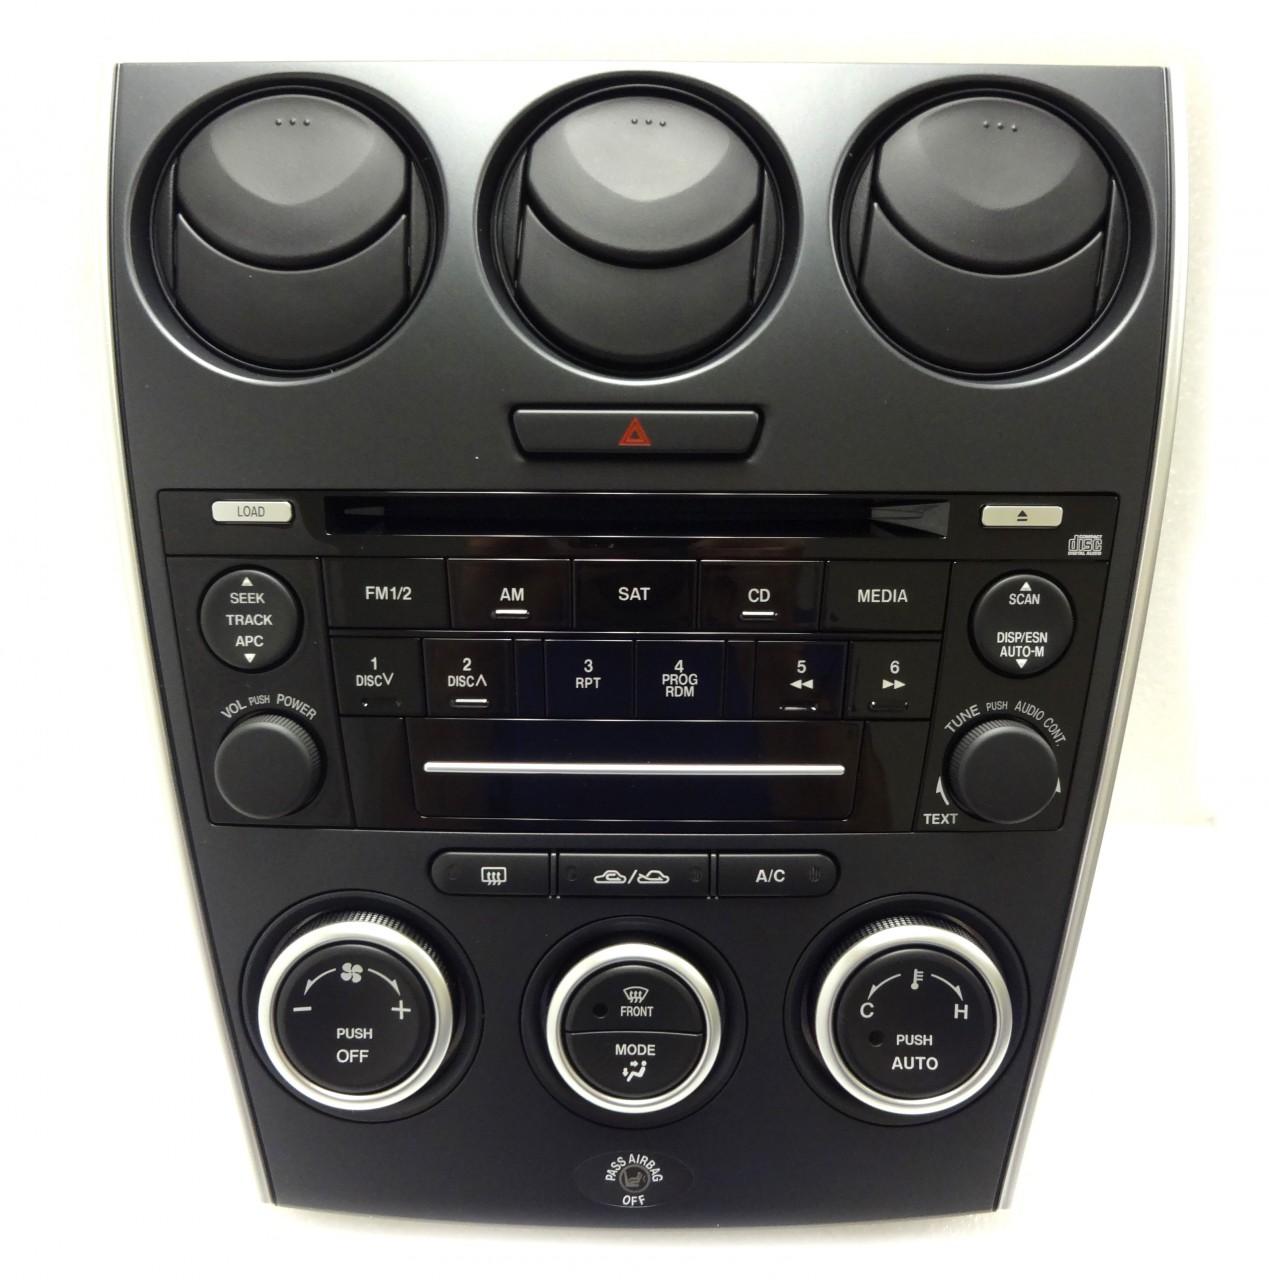 new 06 07 08 mazda 6 radio stereo cd player auto climate temp controls oem ebay